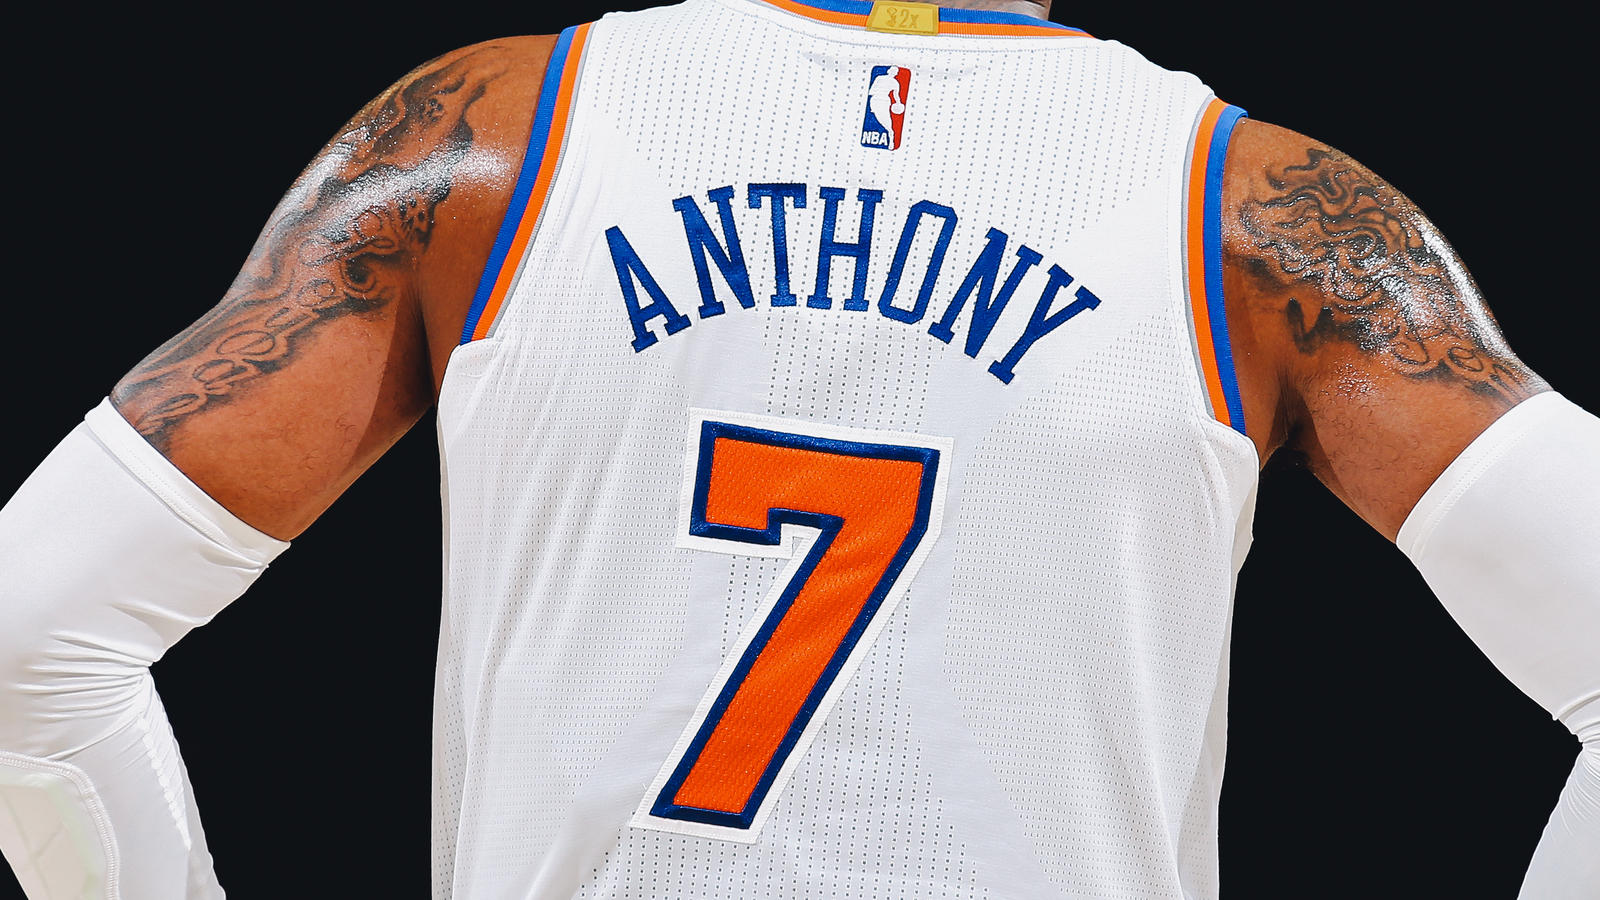 Jordan Brand Athlete Carmelo Anthony